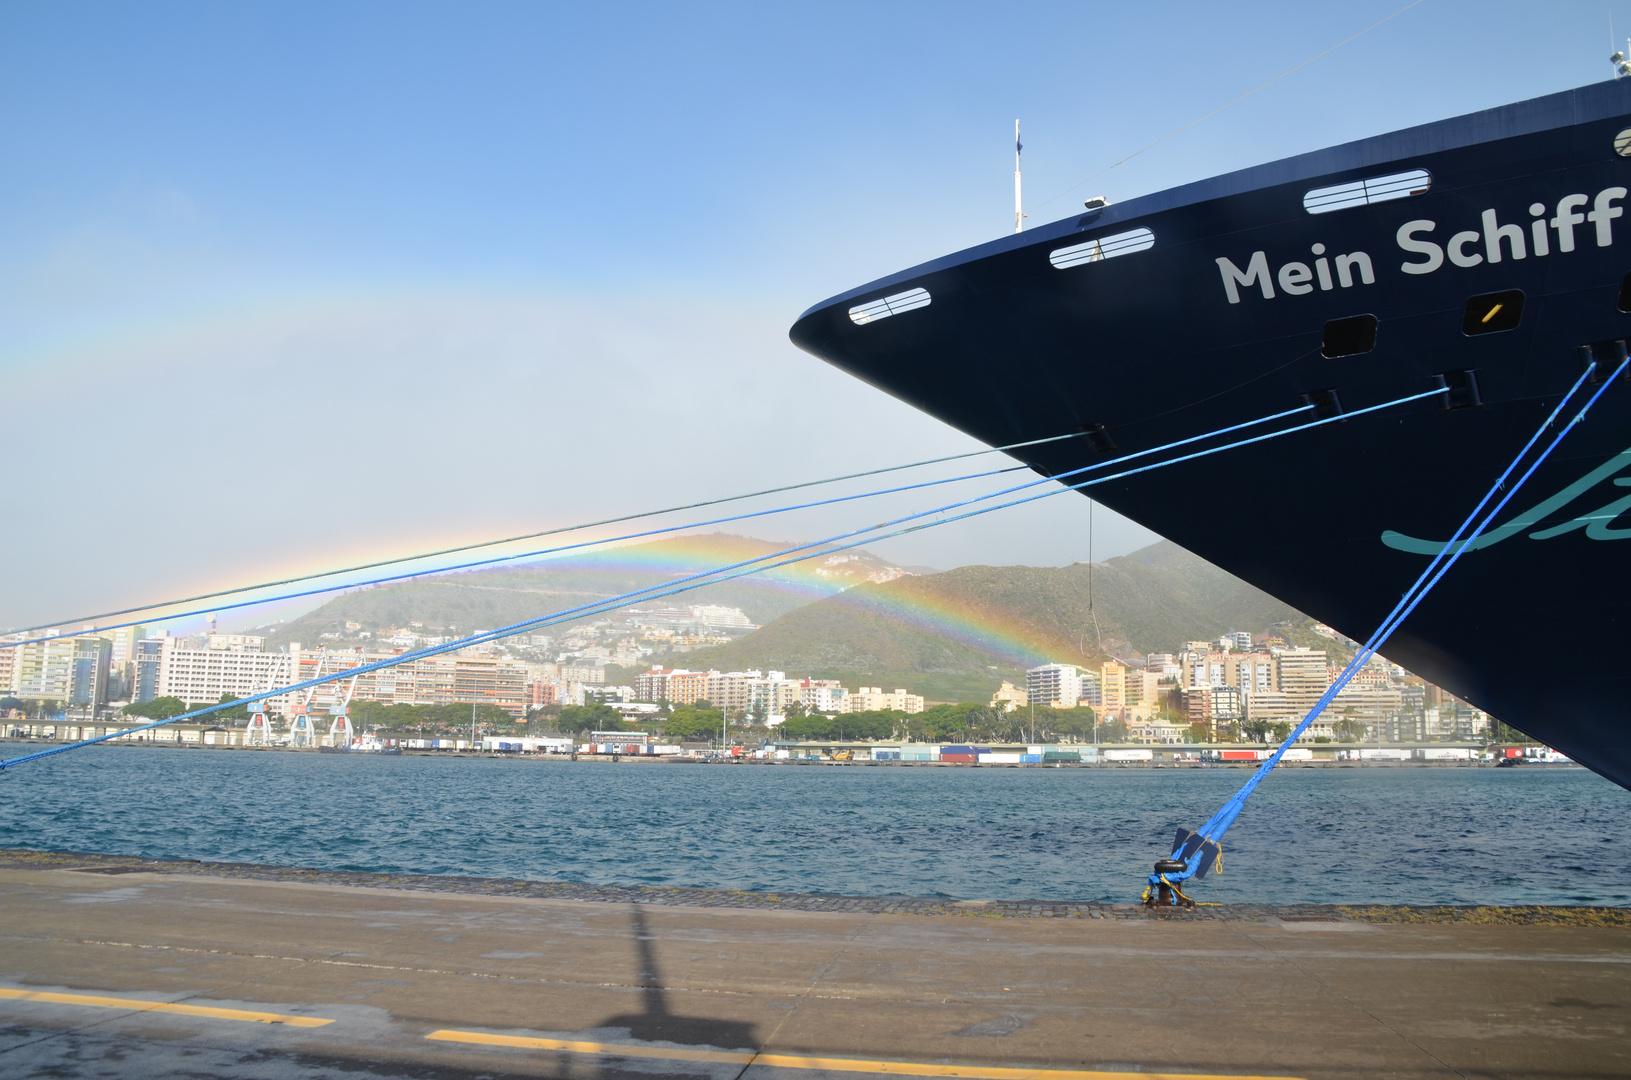 Regenbogen in Teneriffa